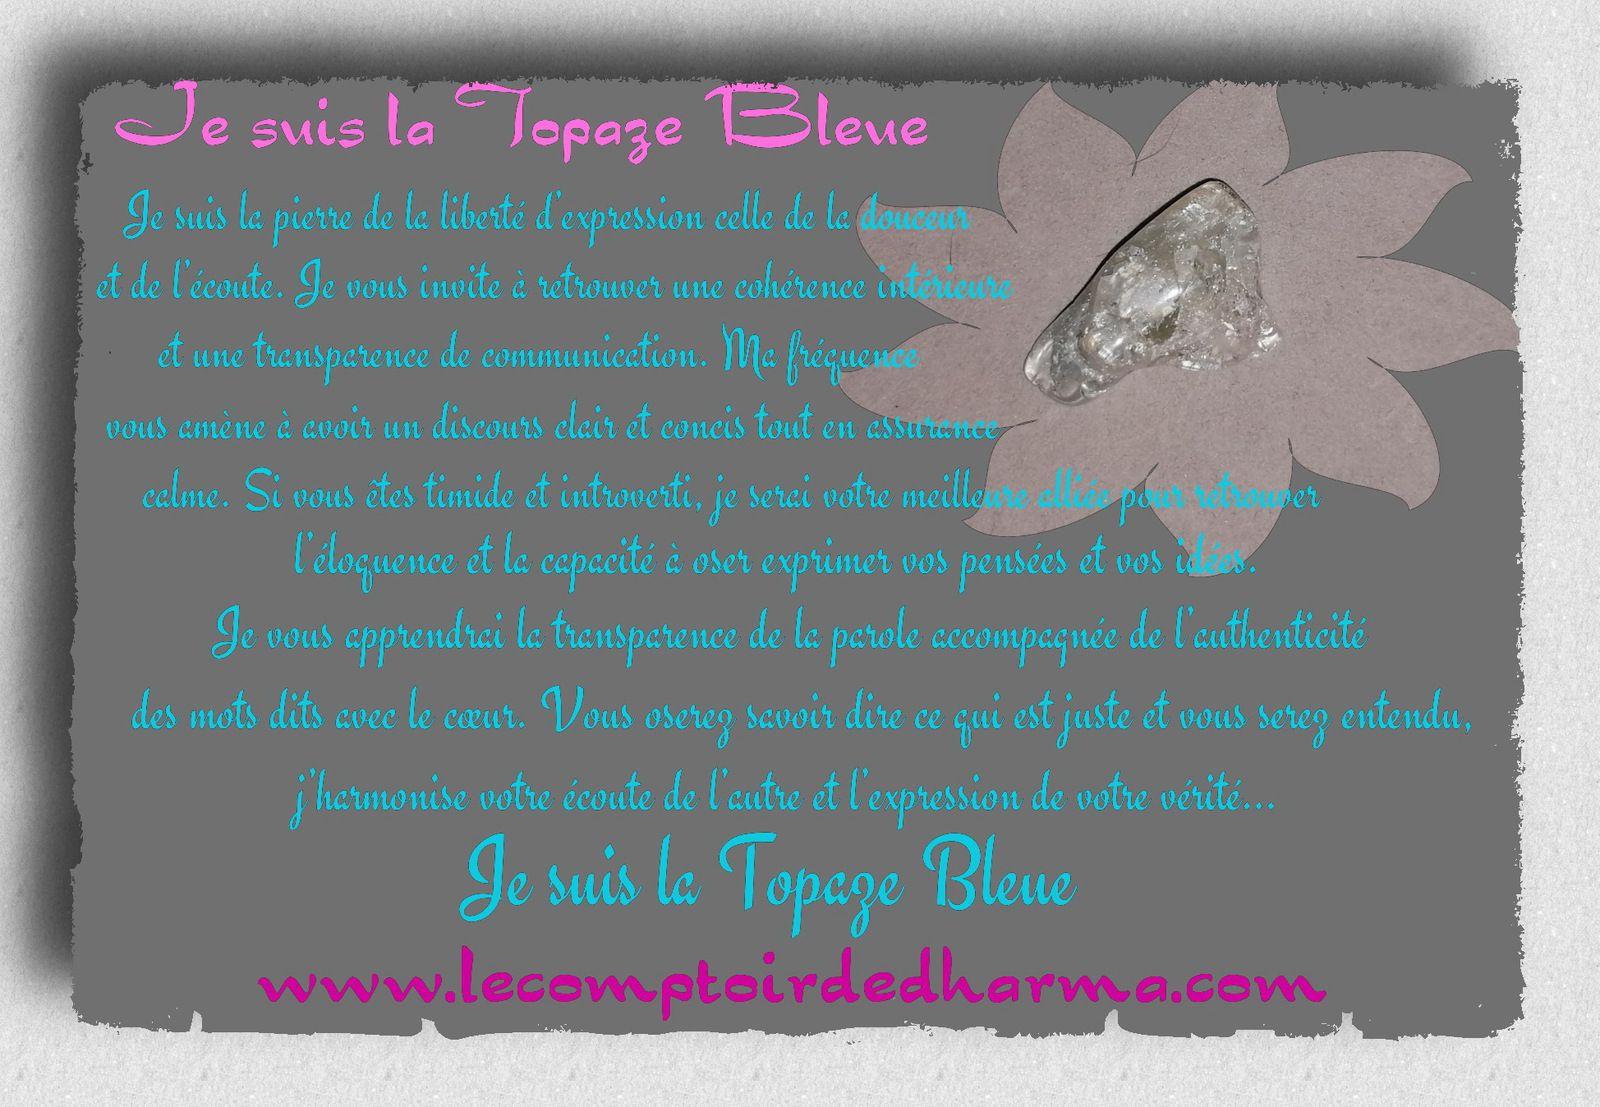 la Topaze Bleue